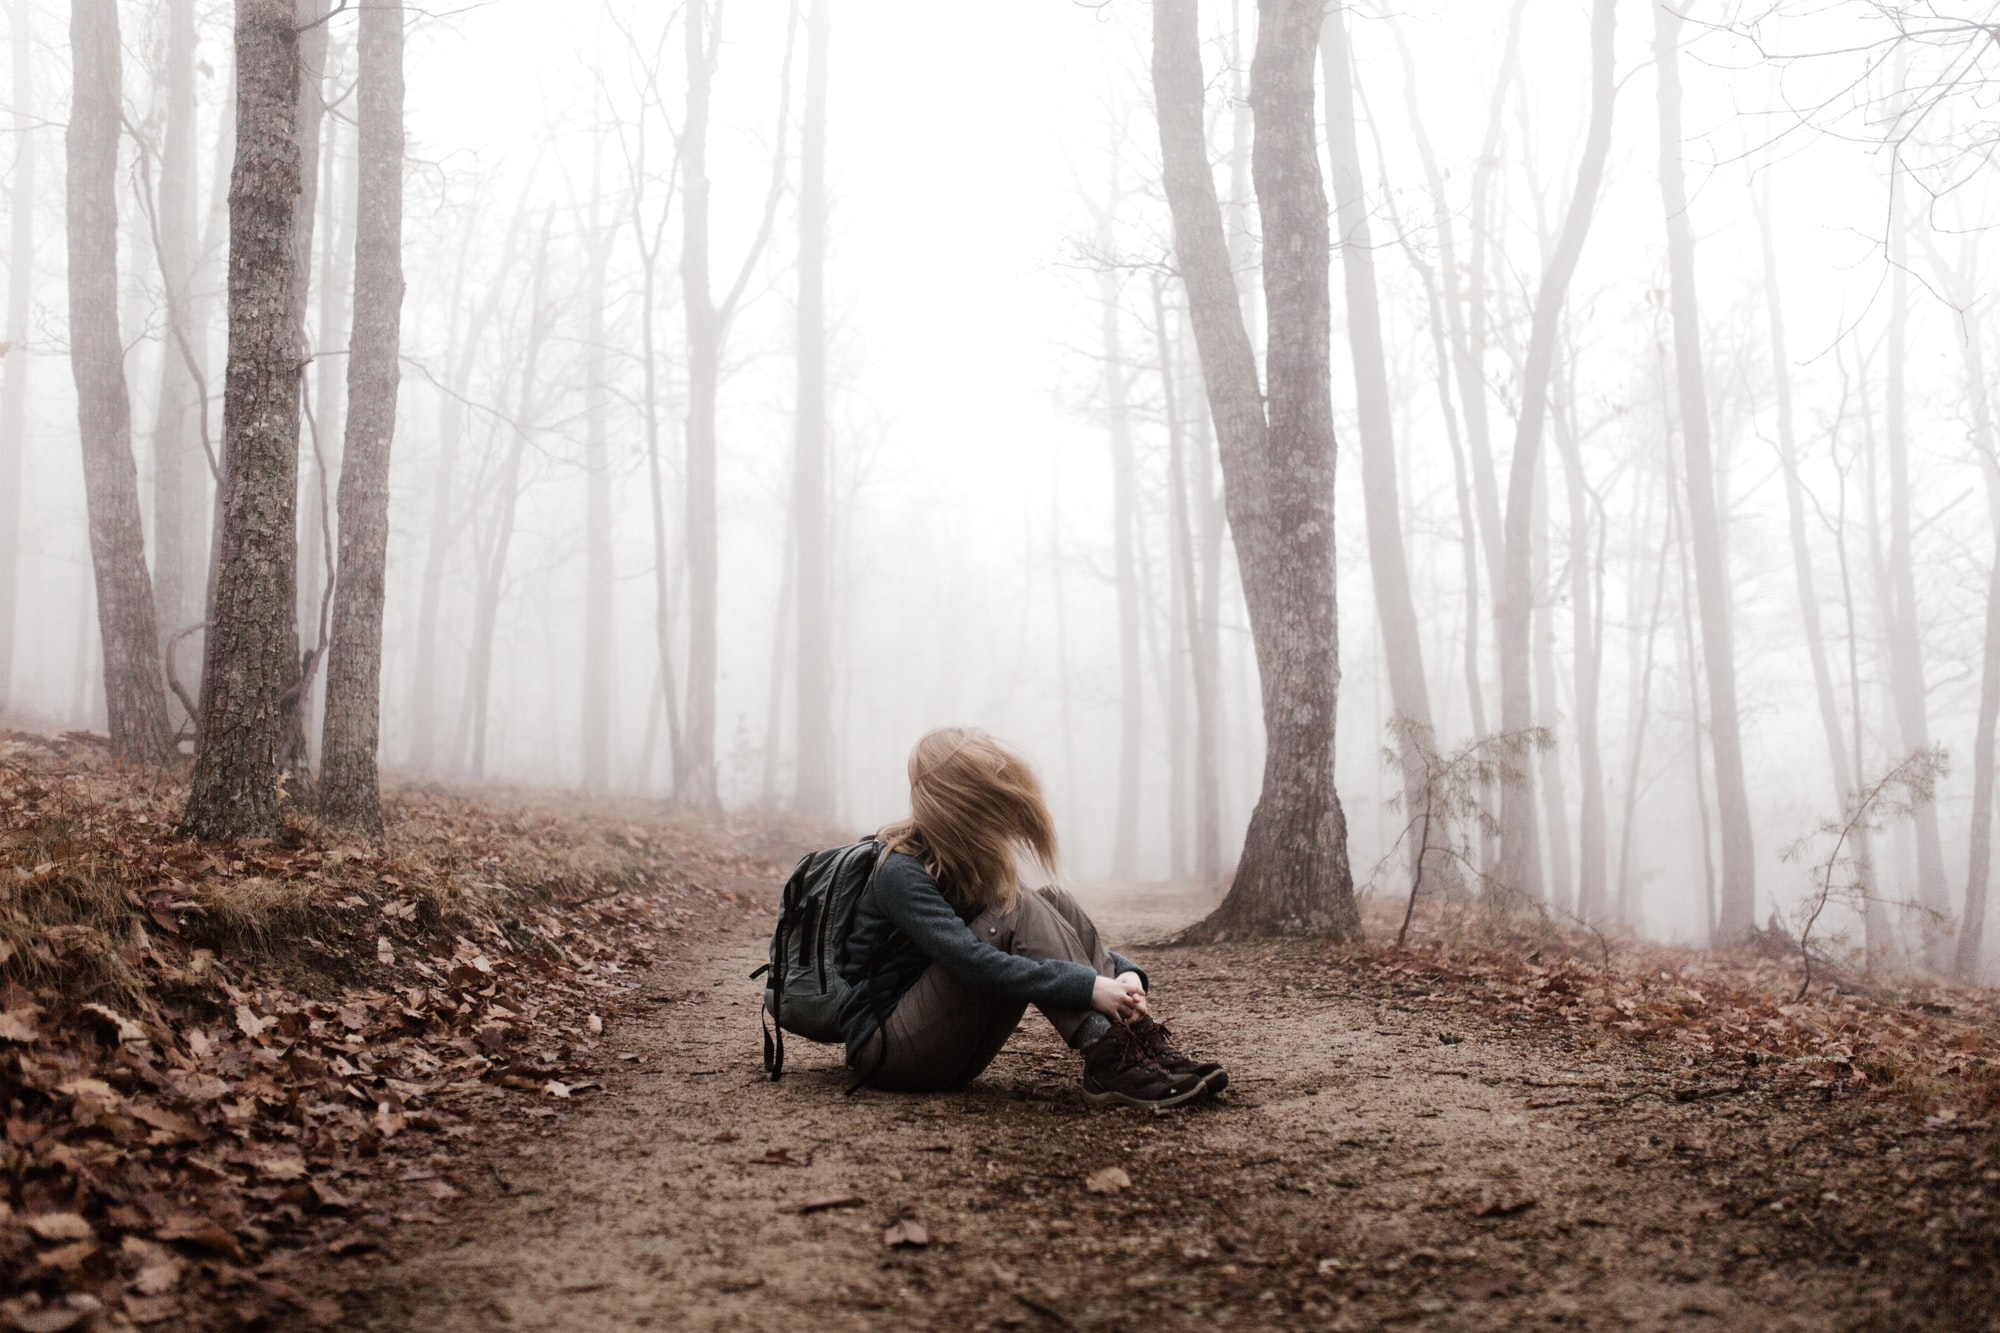 Kenapa Cewek Lebih Mementingkan Perasaan Daripada Emosi?